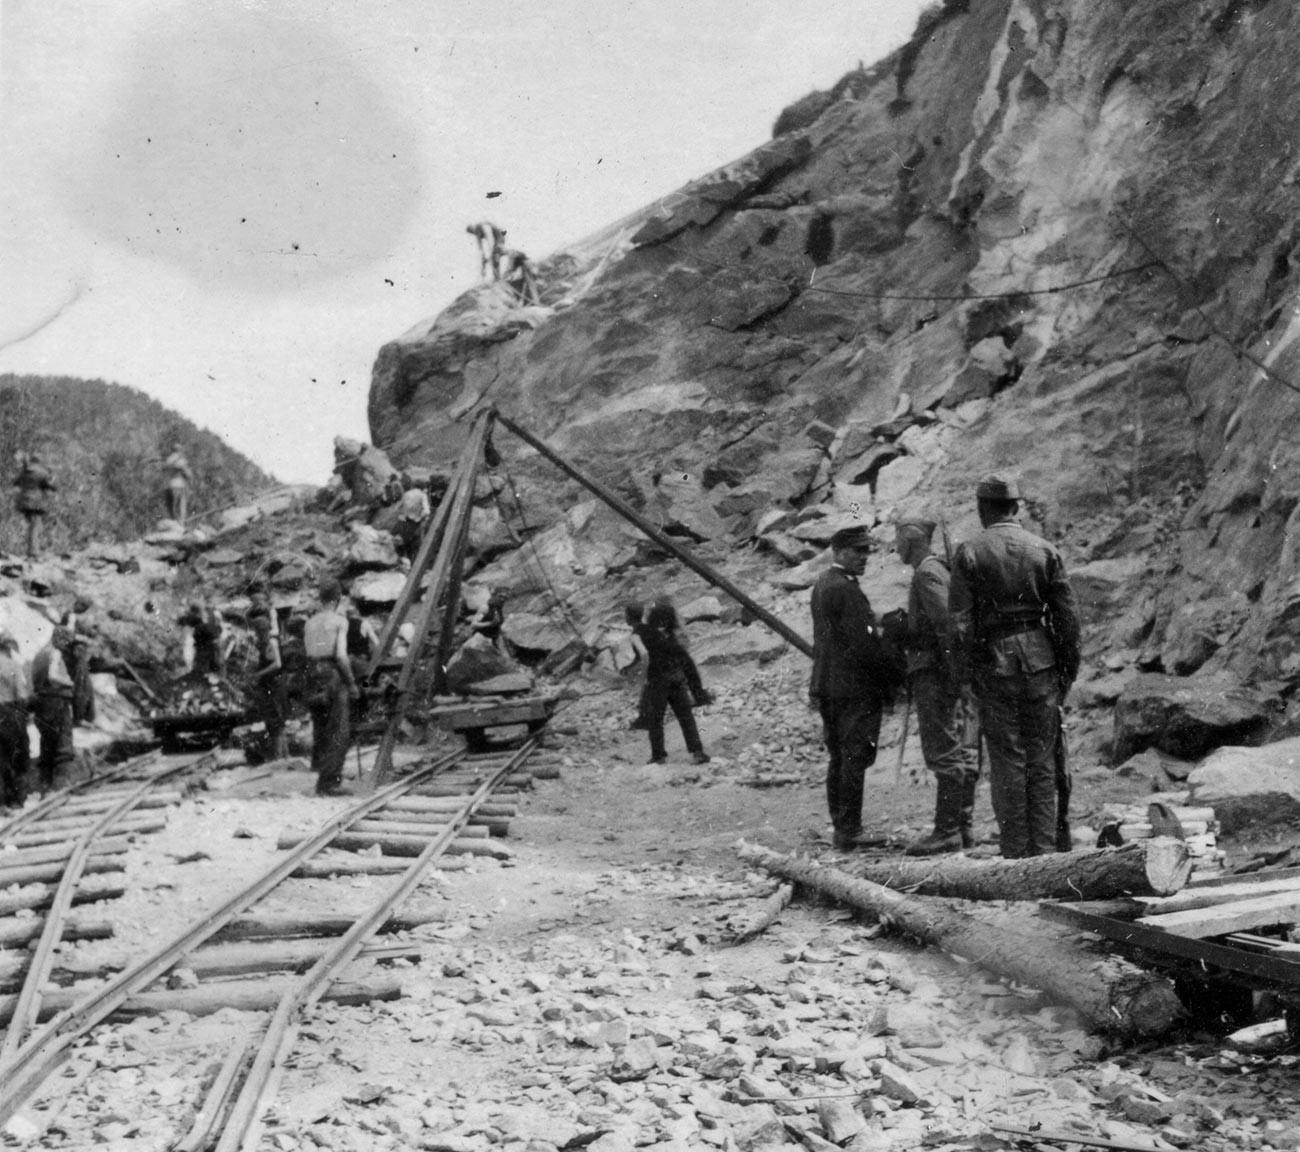 Tentara Soviet yang menjadi tawanan perang Nazi Jerman bekerja paksa membangun